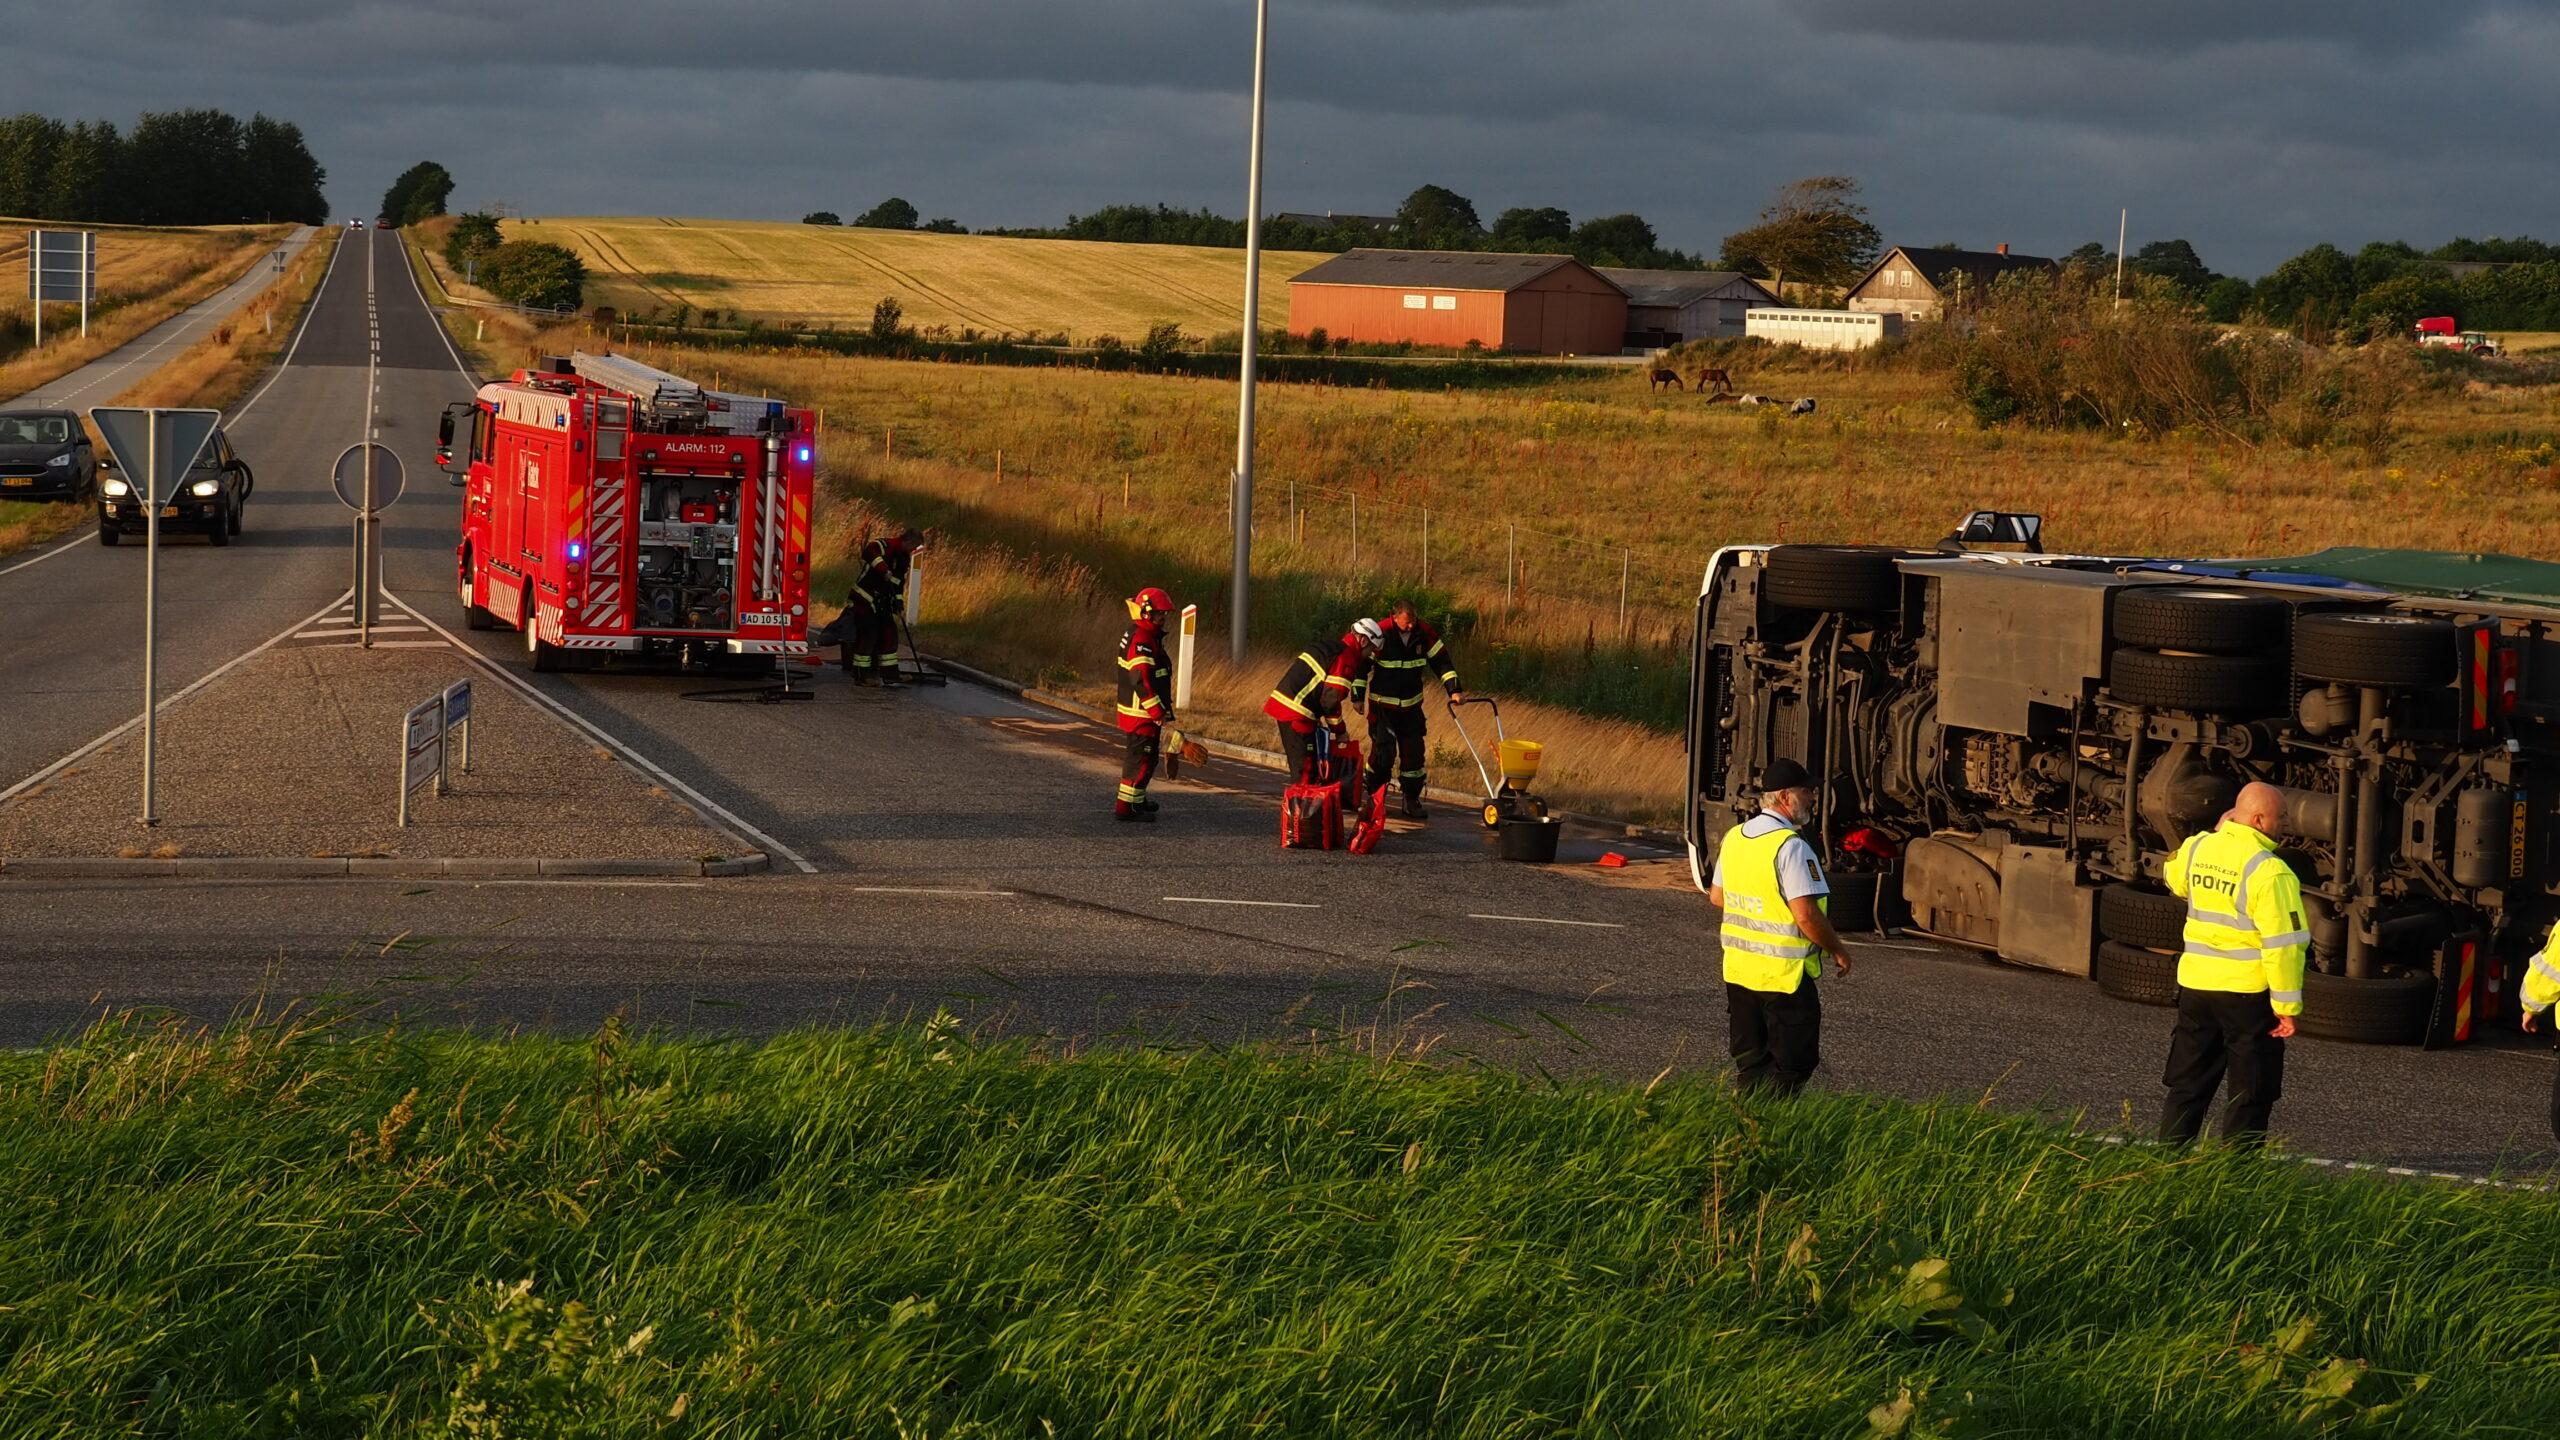 Ulykke i Holstebro - væltet lastbil